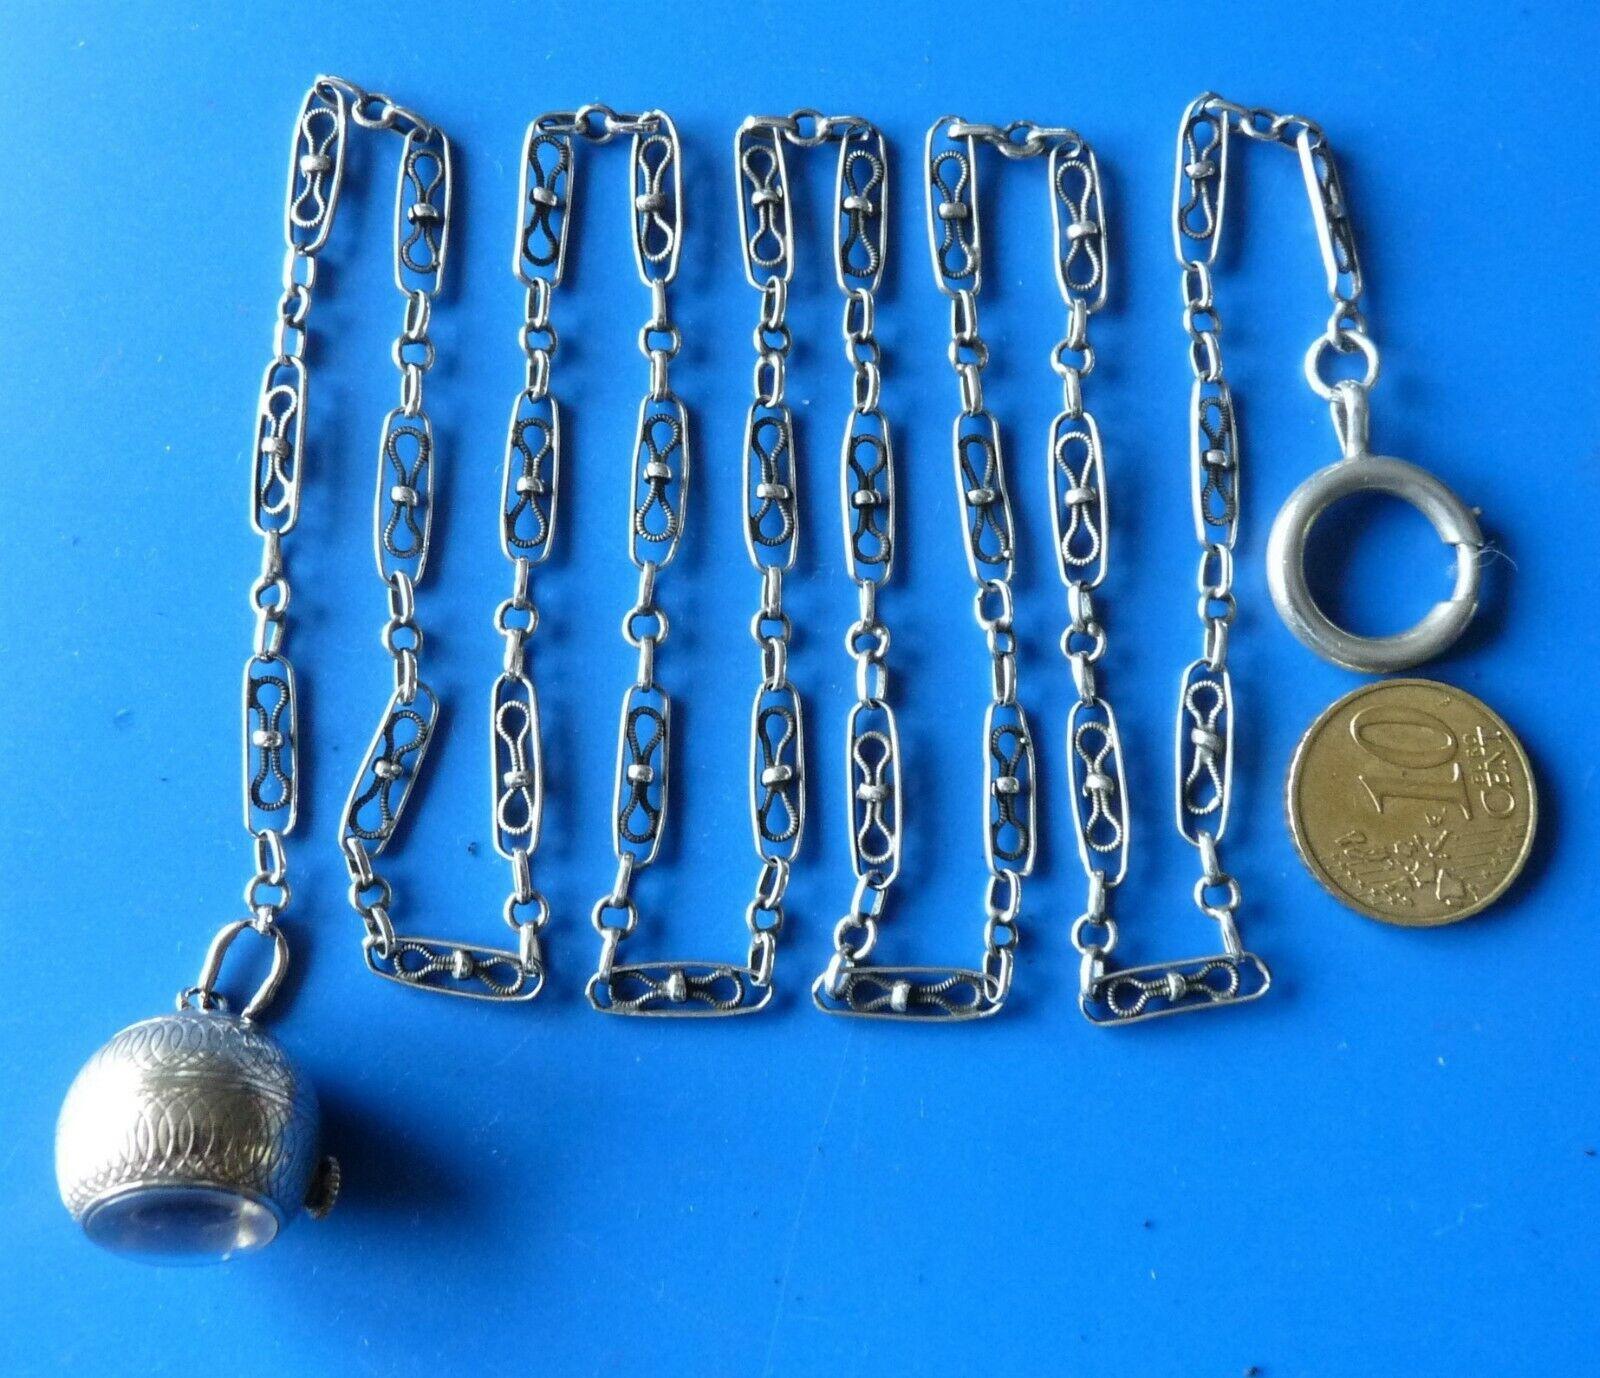 Antique solid silver xix chain watch pocket ancien chaine montre argent massif